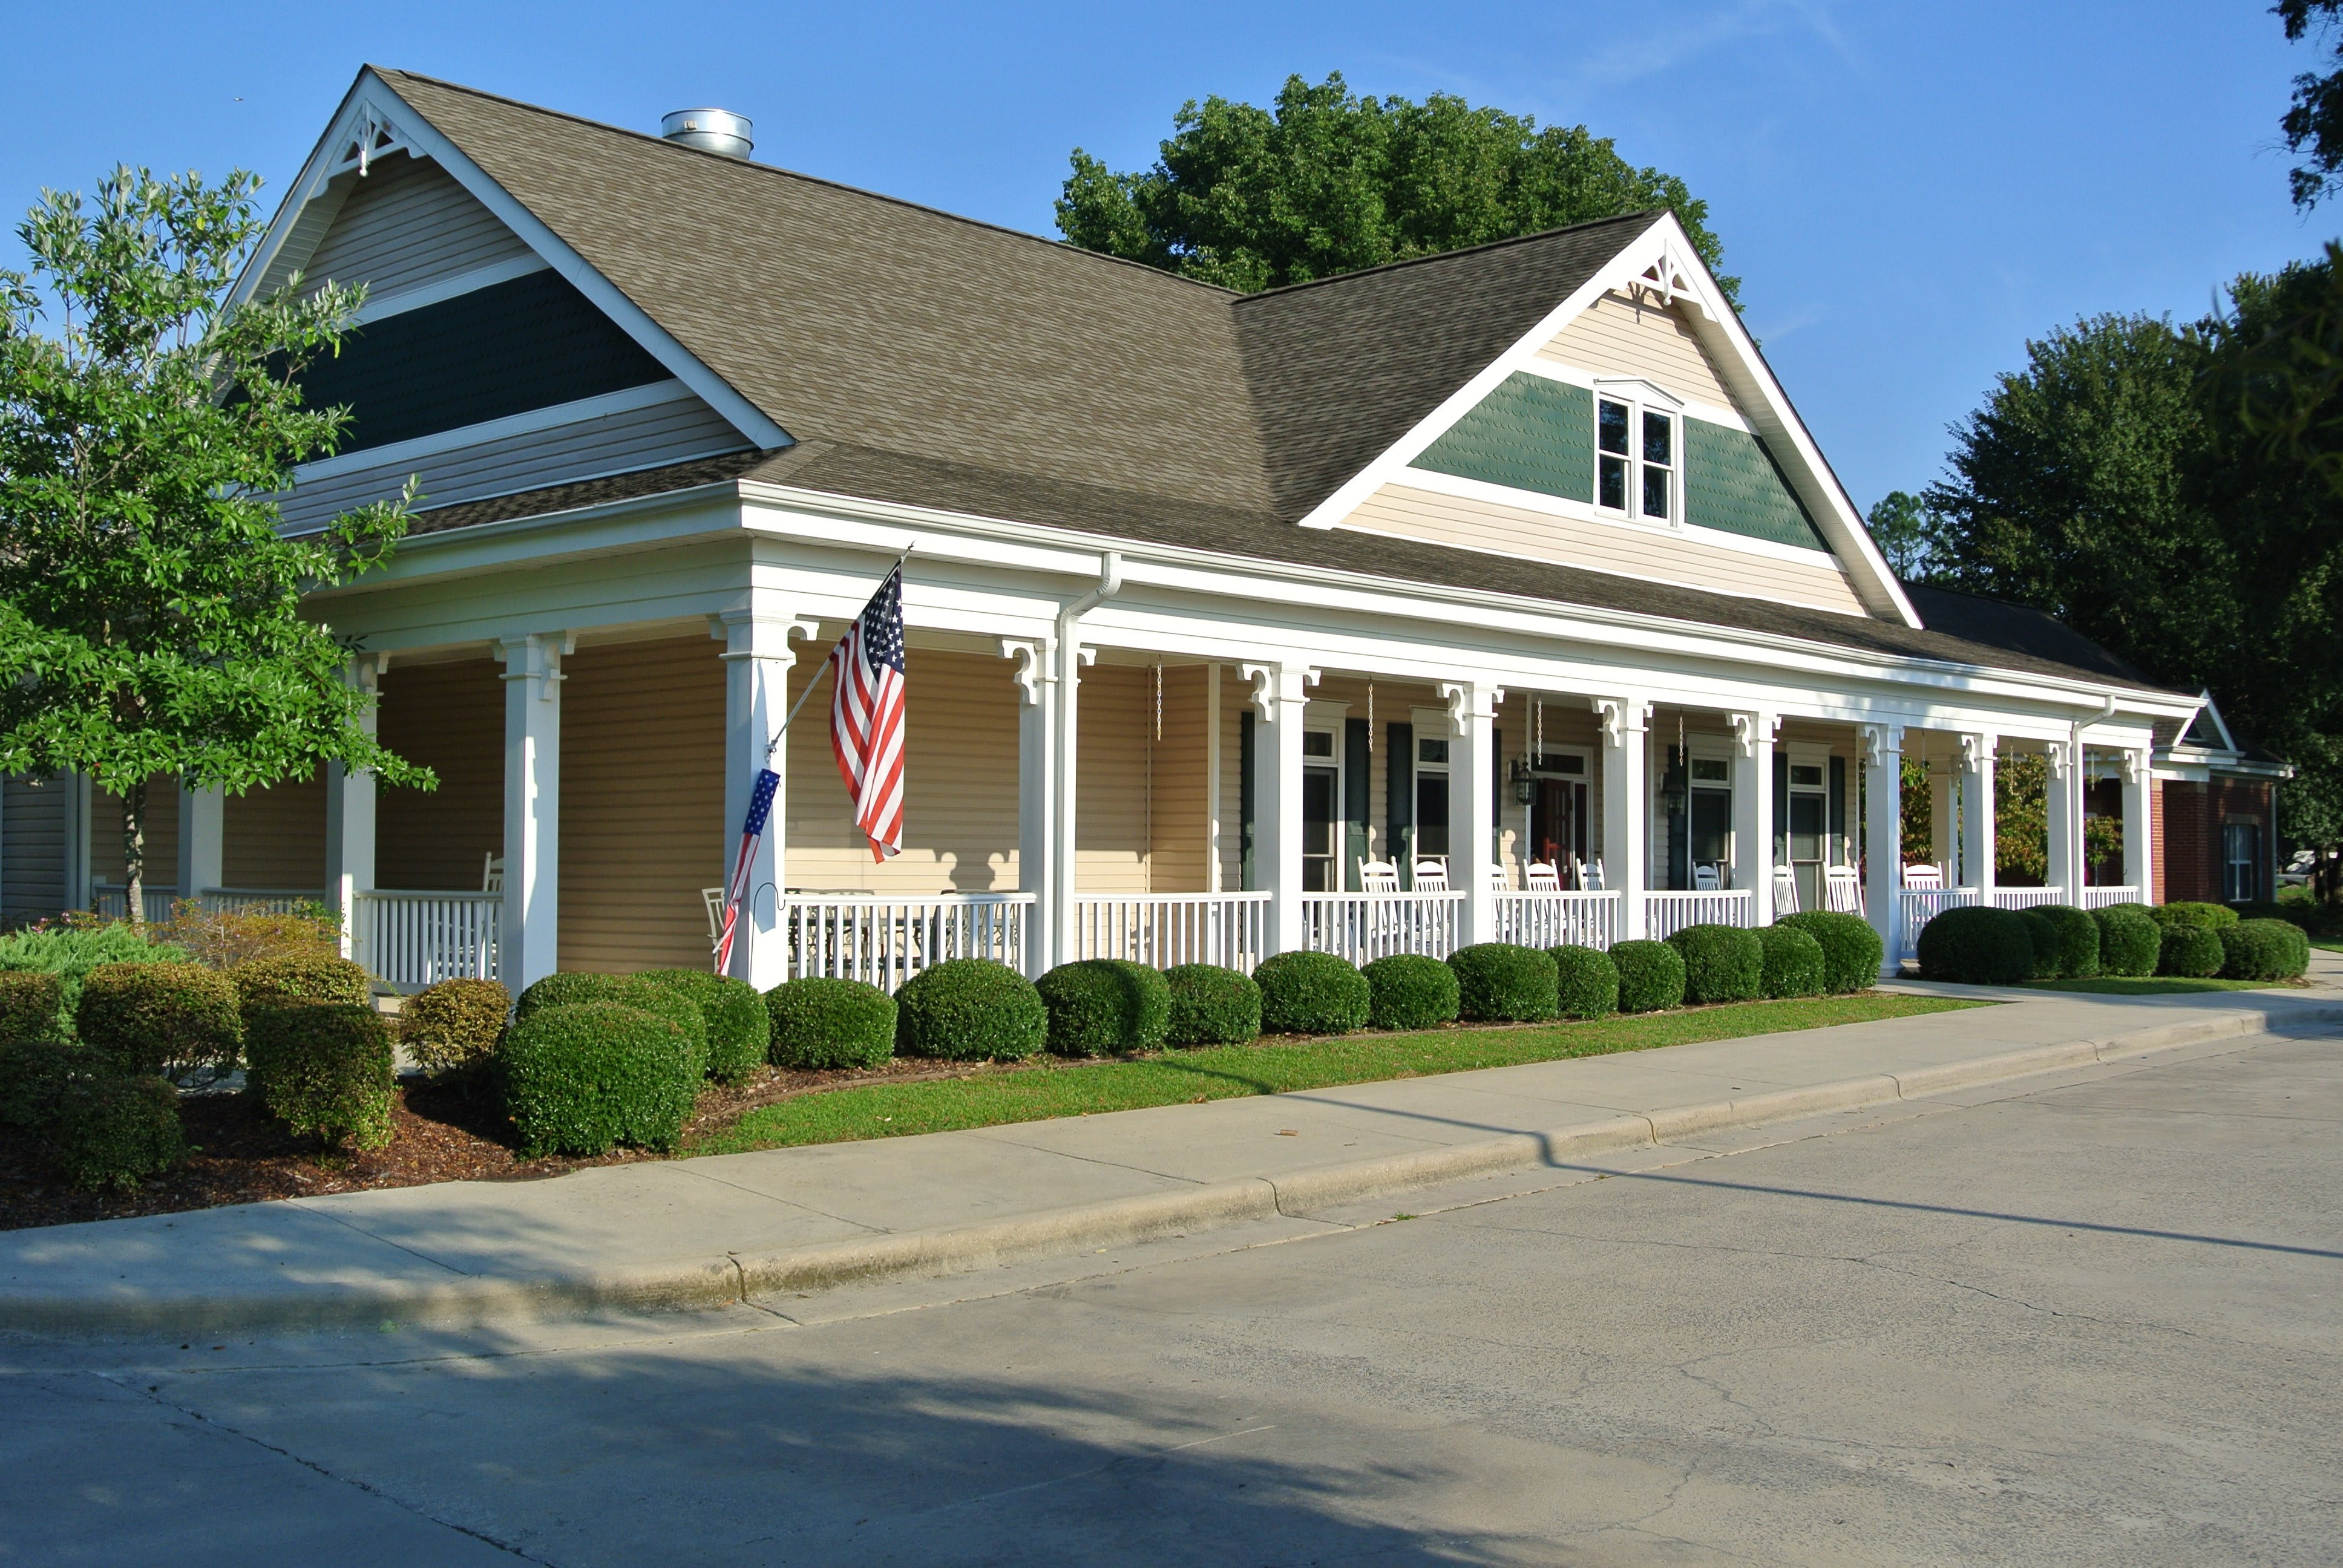 Photo 1 of Columbia Cottage - Hartselle